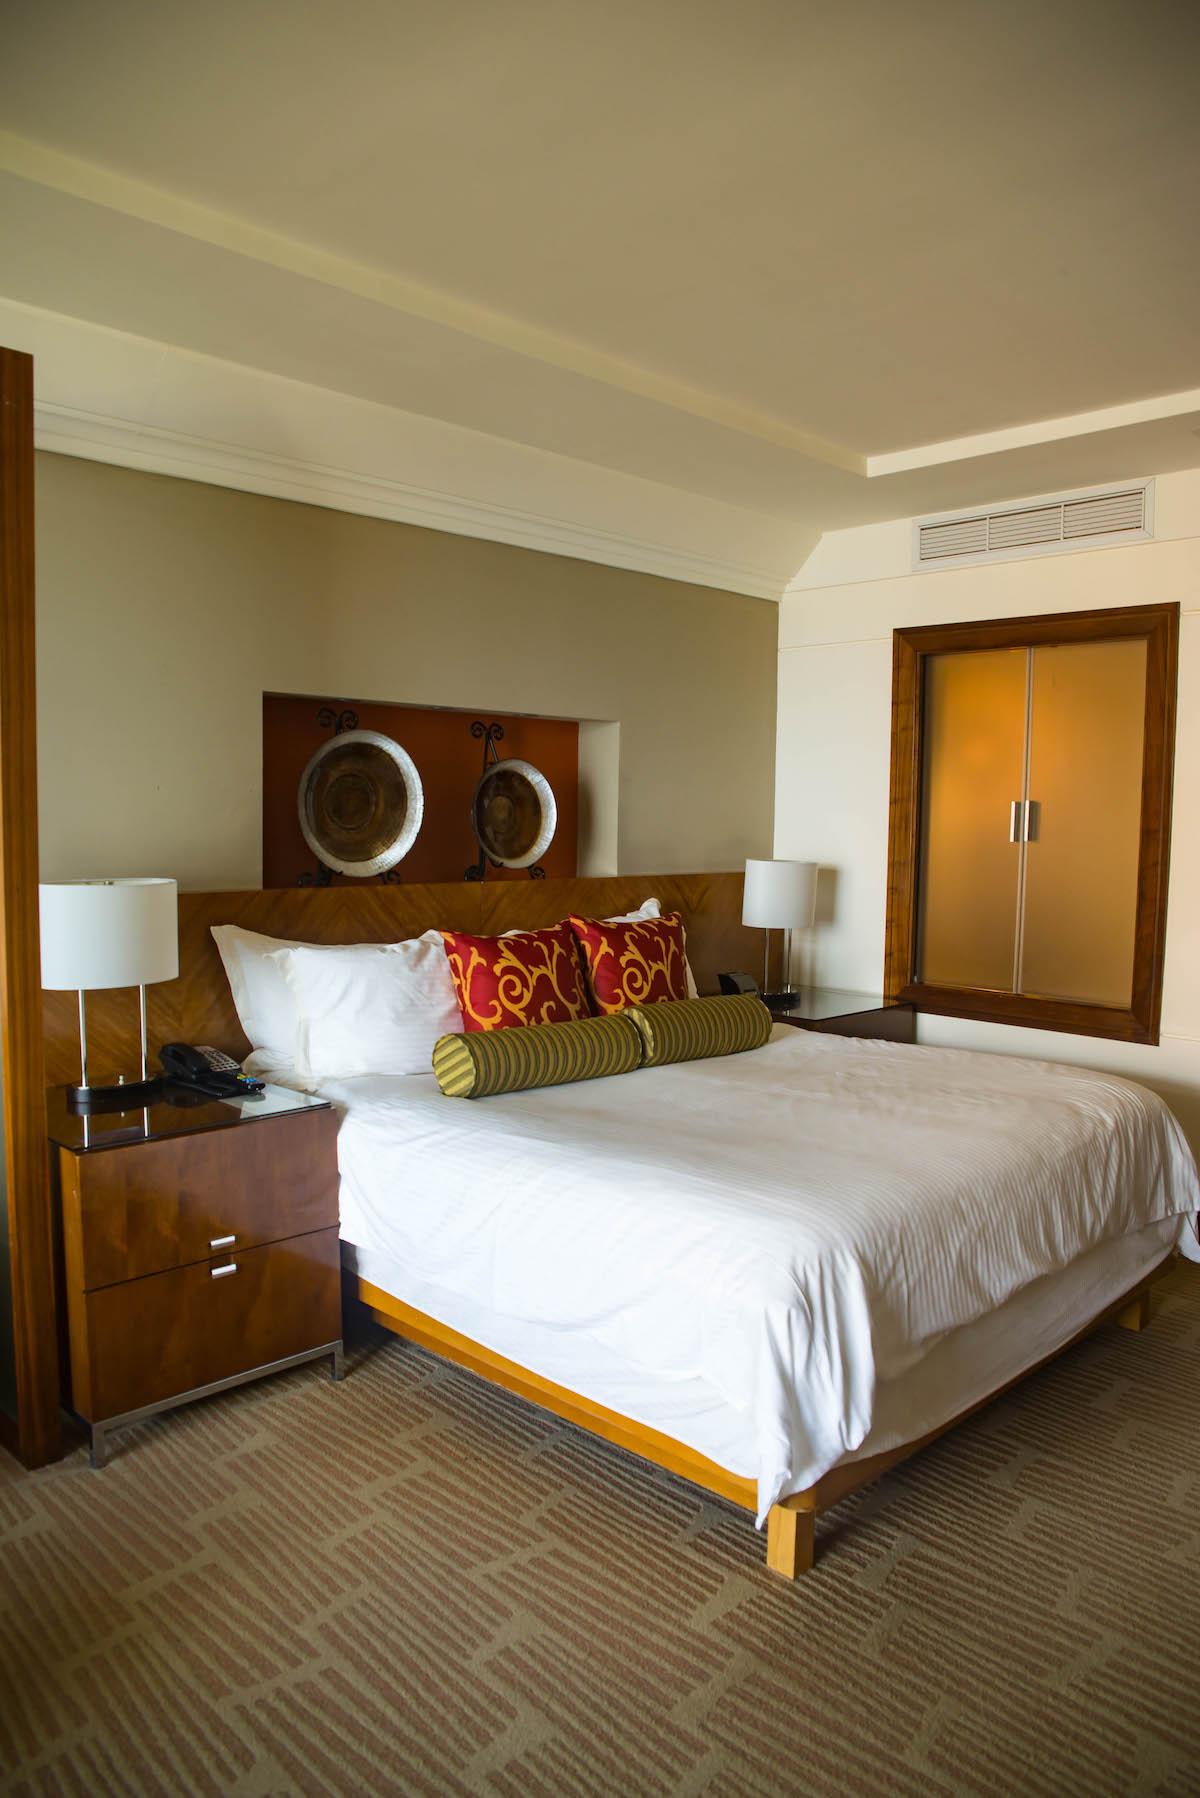 The Reef Atlantis Guest Room